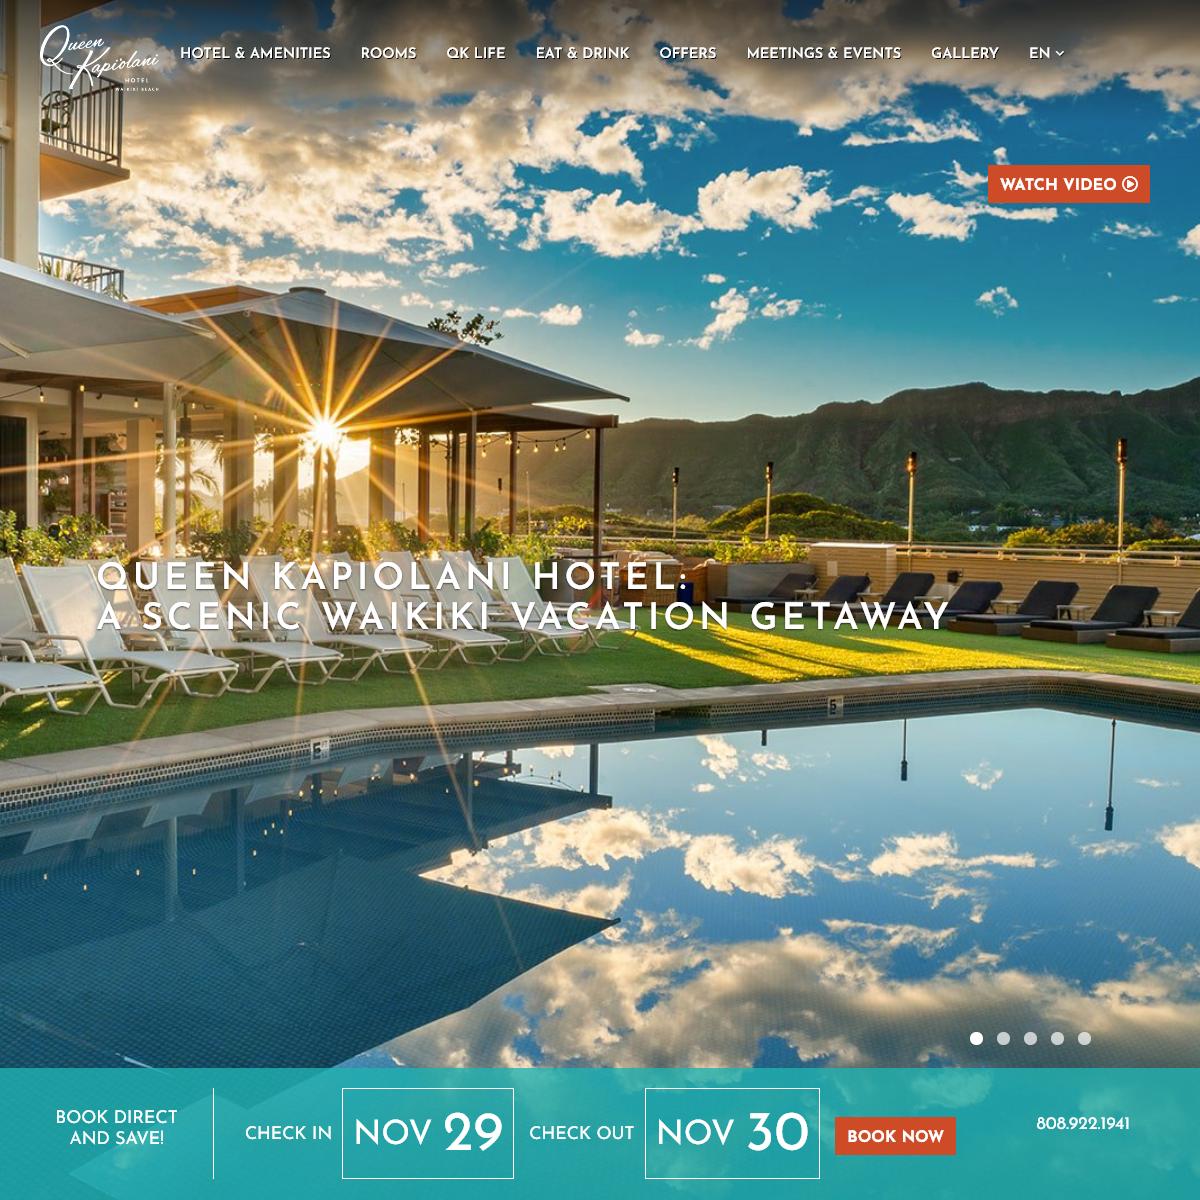 Waikiki Beach Hotels - Queen Kapiolani Hotel